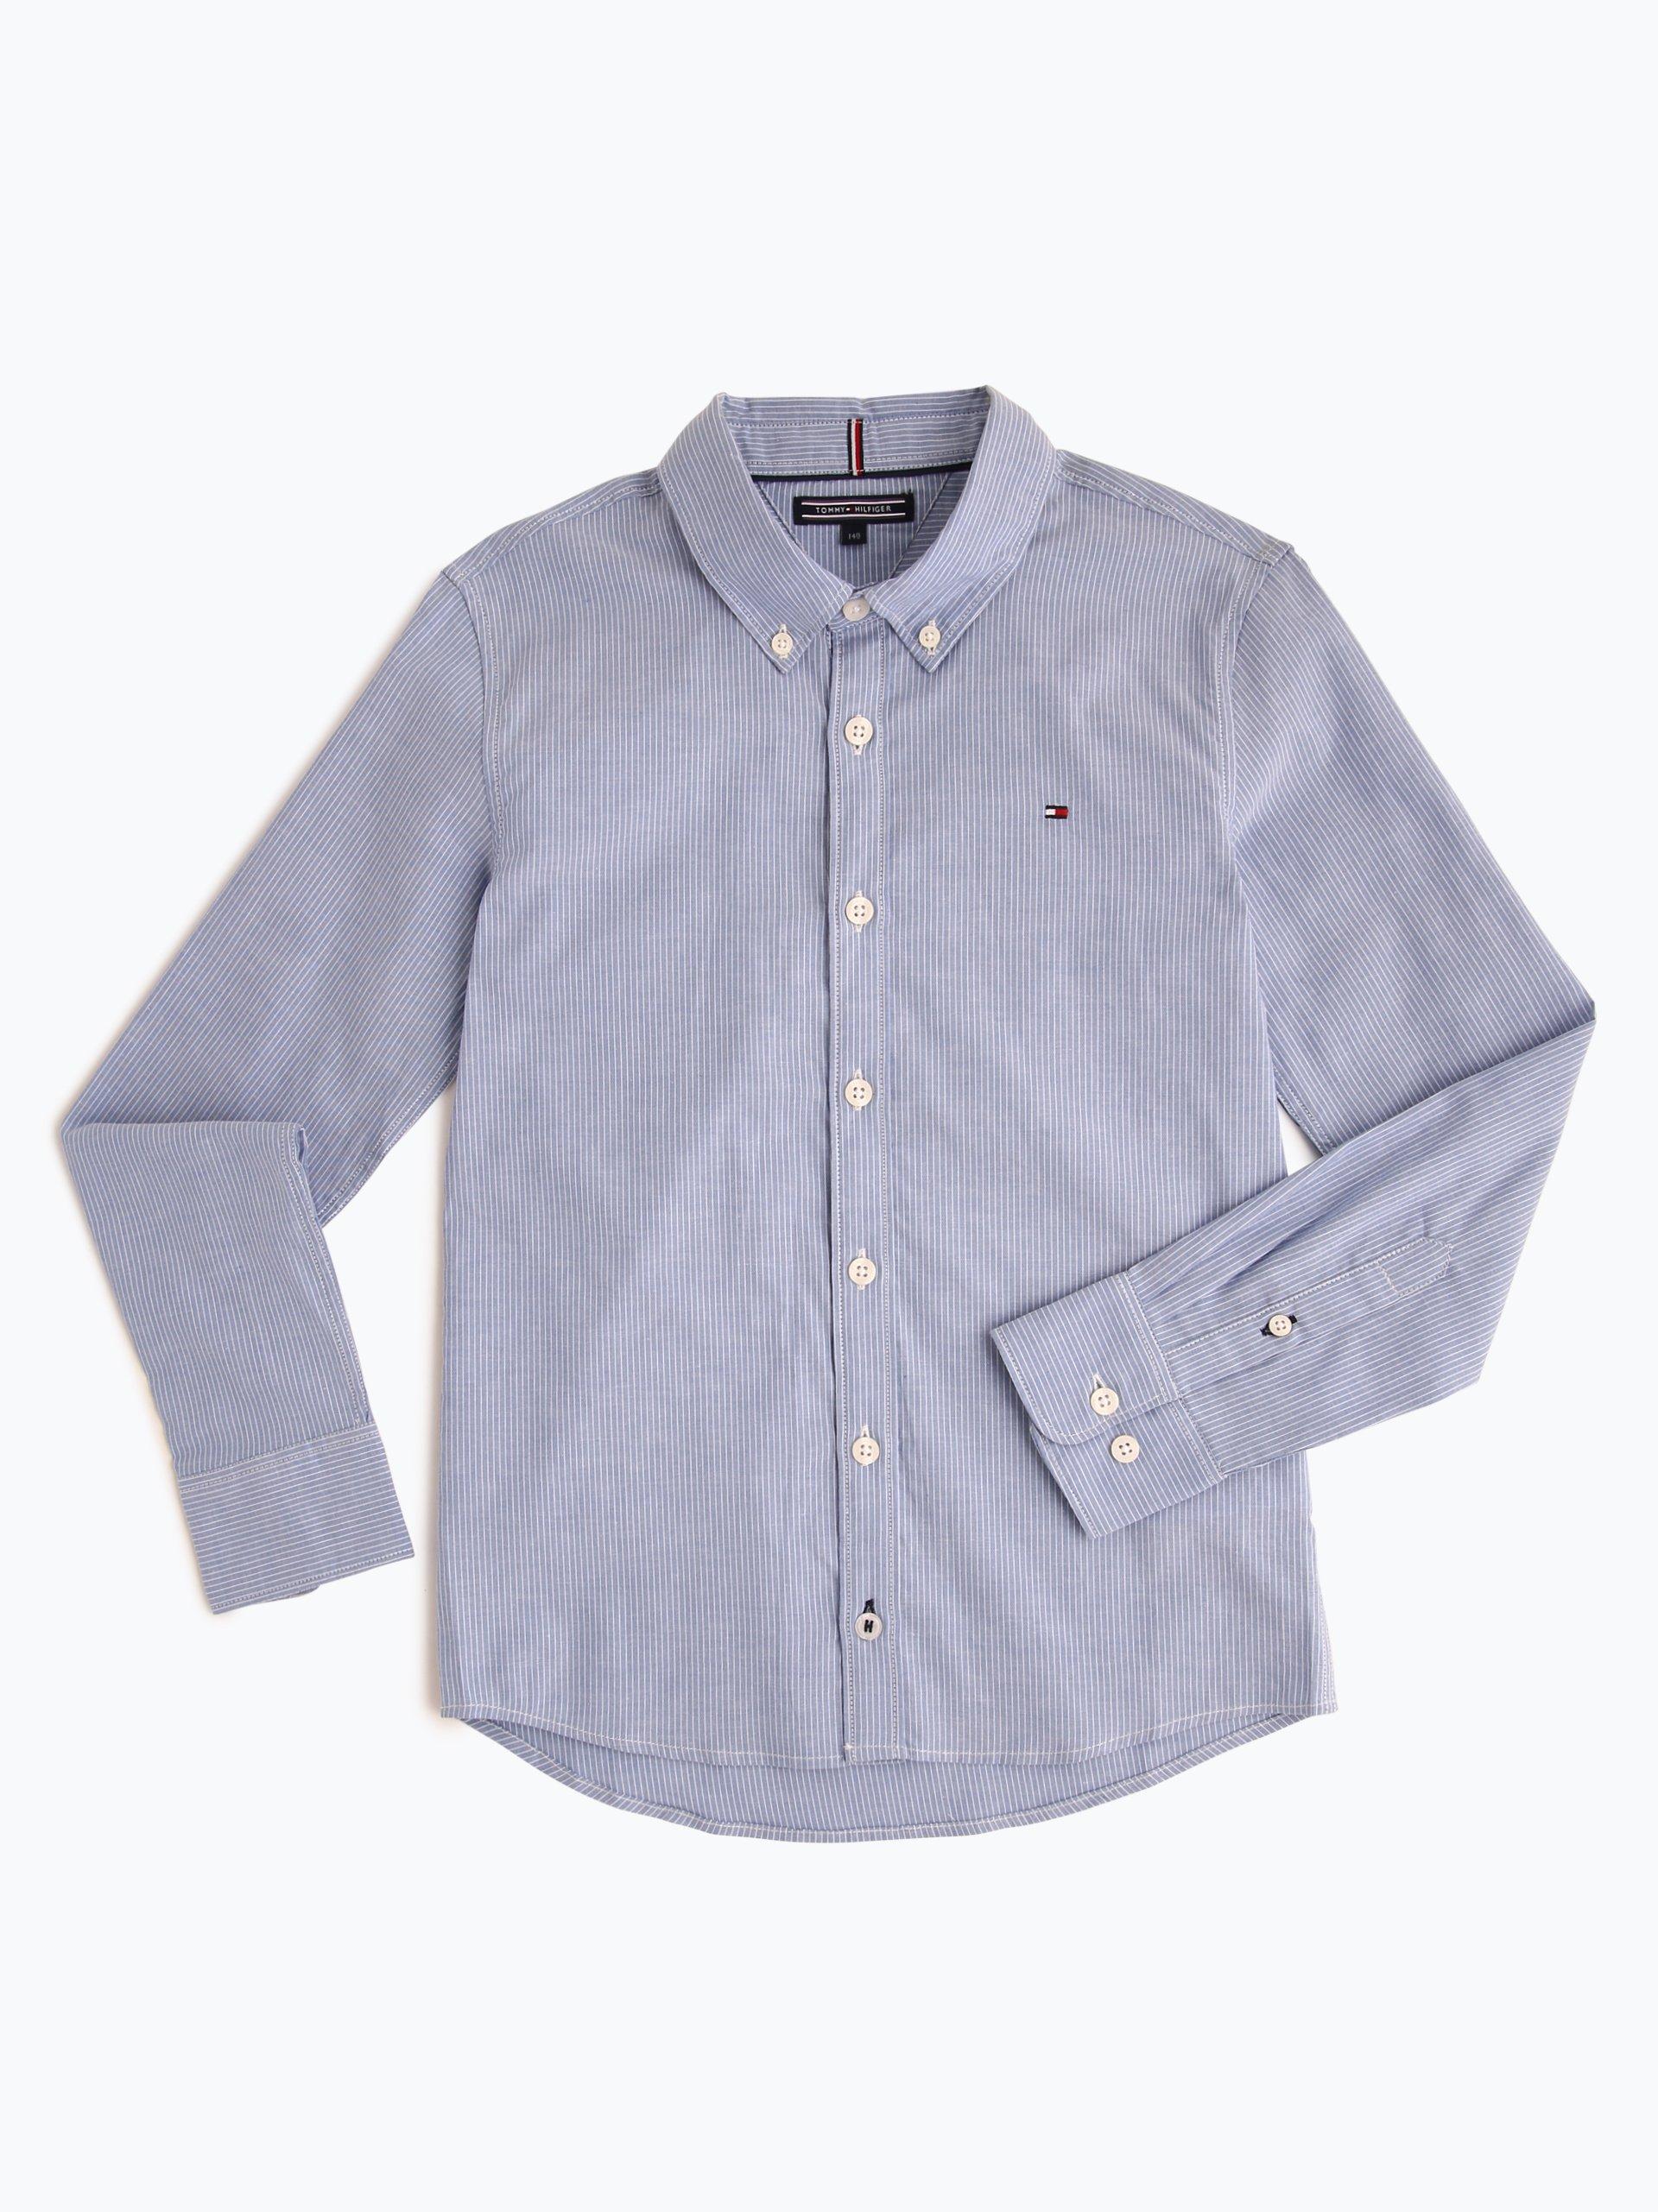 Tommy Hilfiger Jungen Hemd